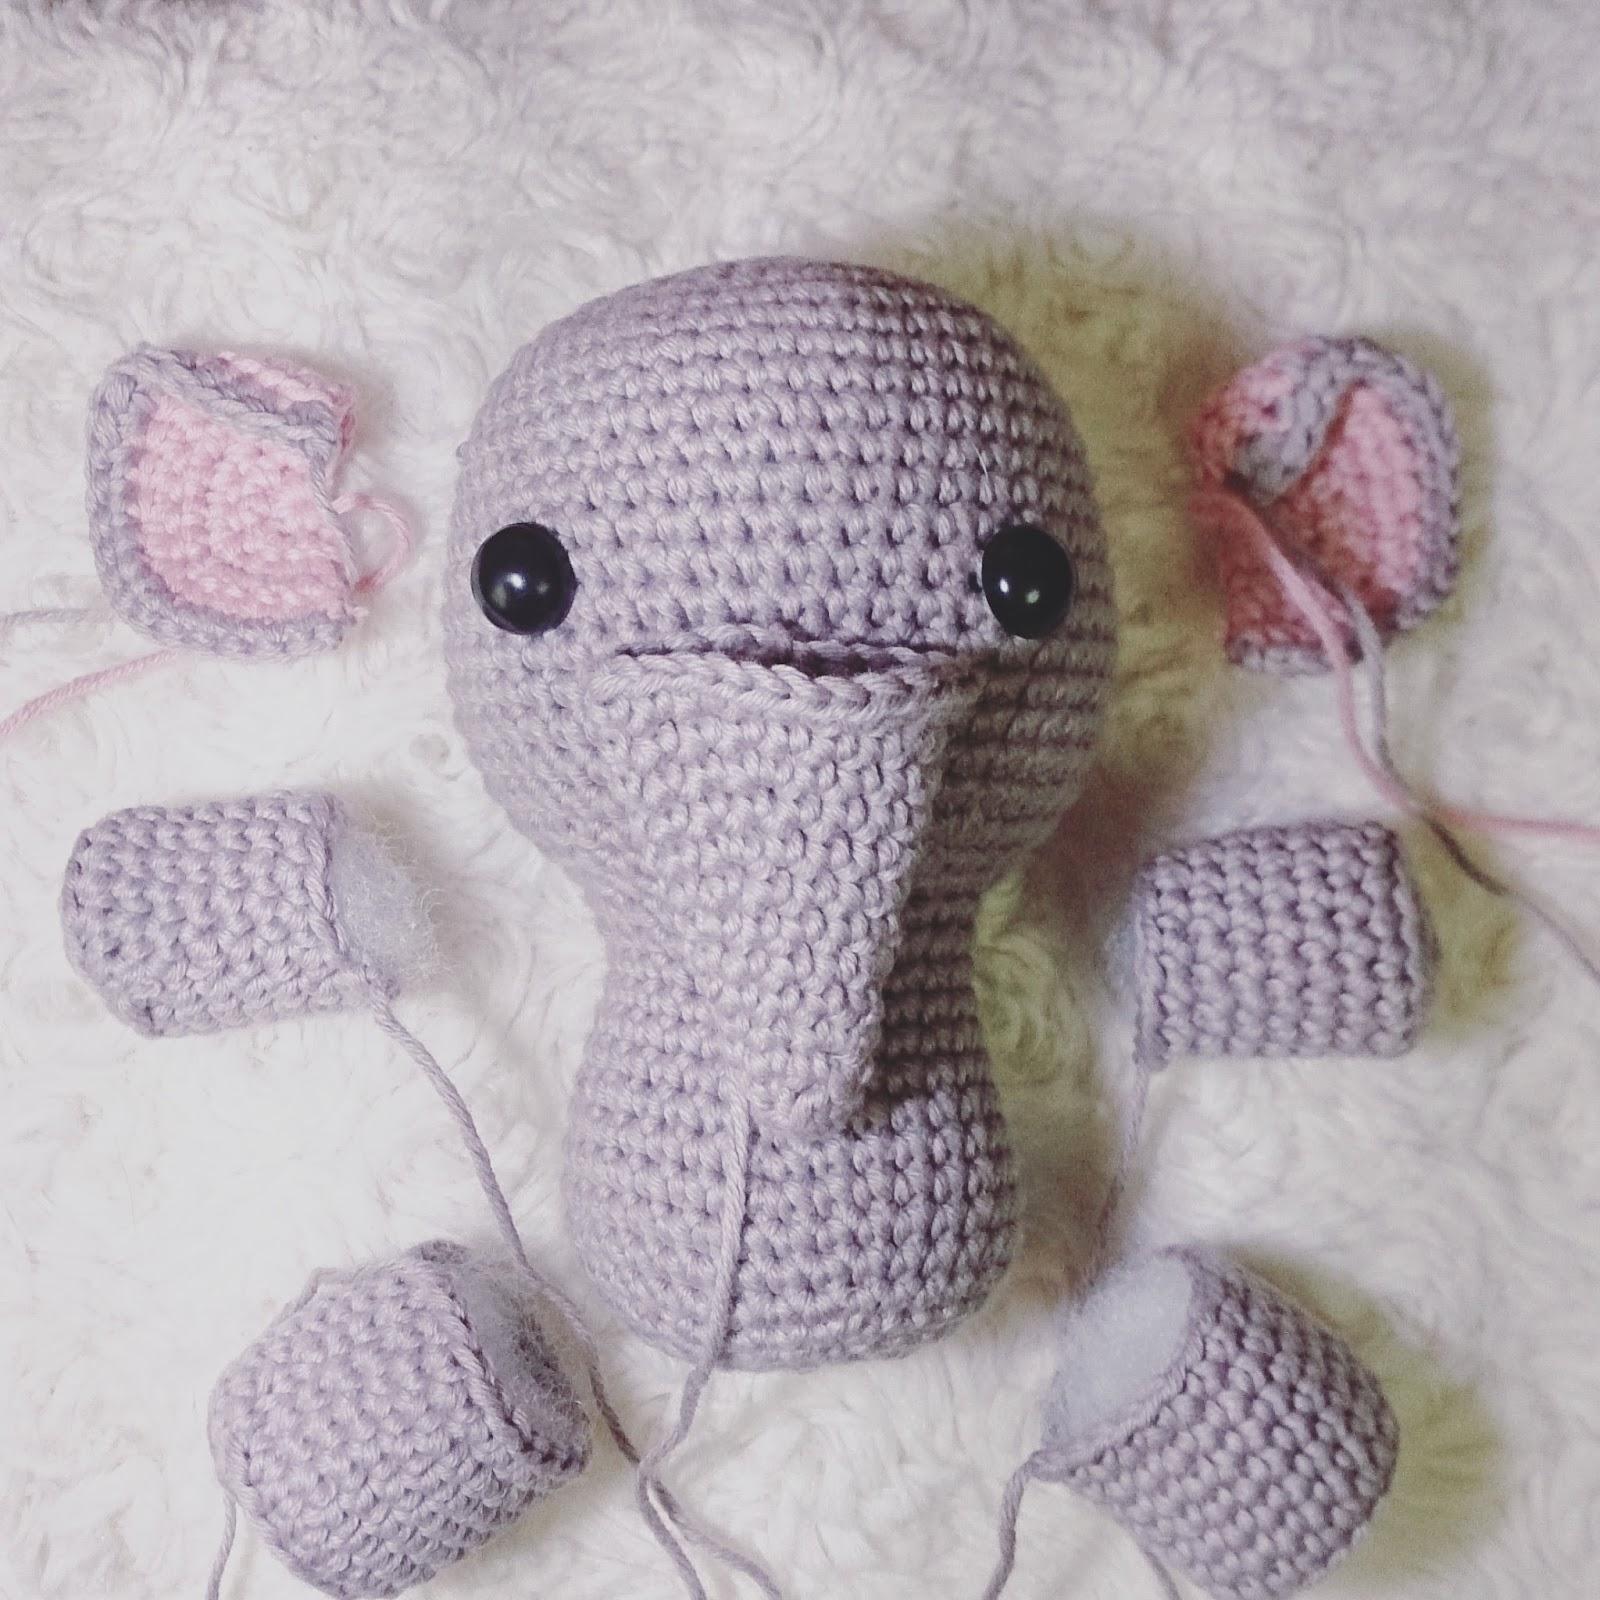 Amigurumi Elephant Free Crochet Pattern | Amigurumi elephant ... | 1600x1600